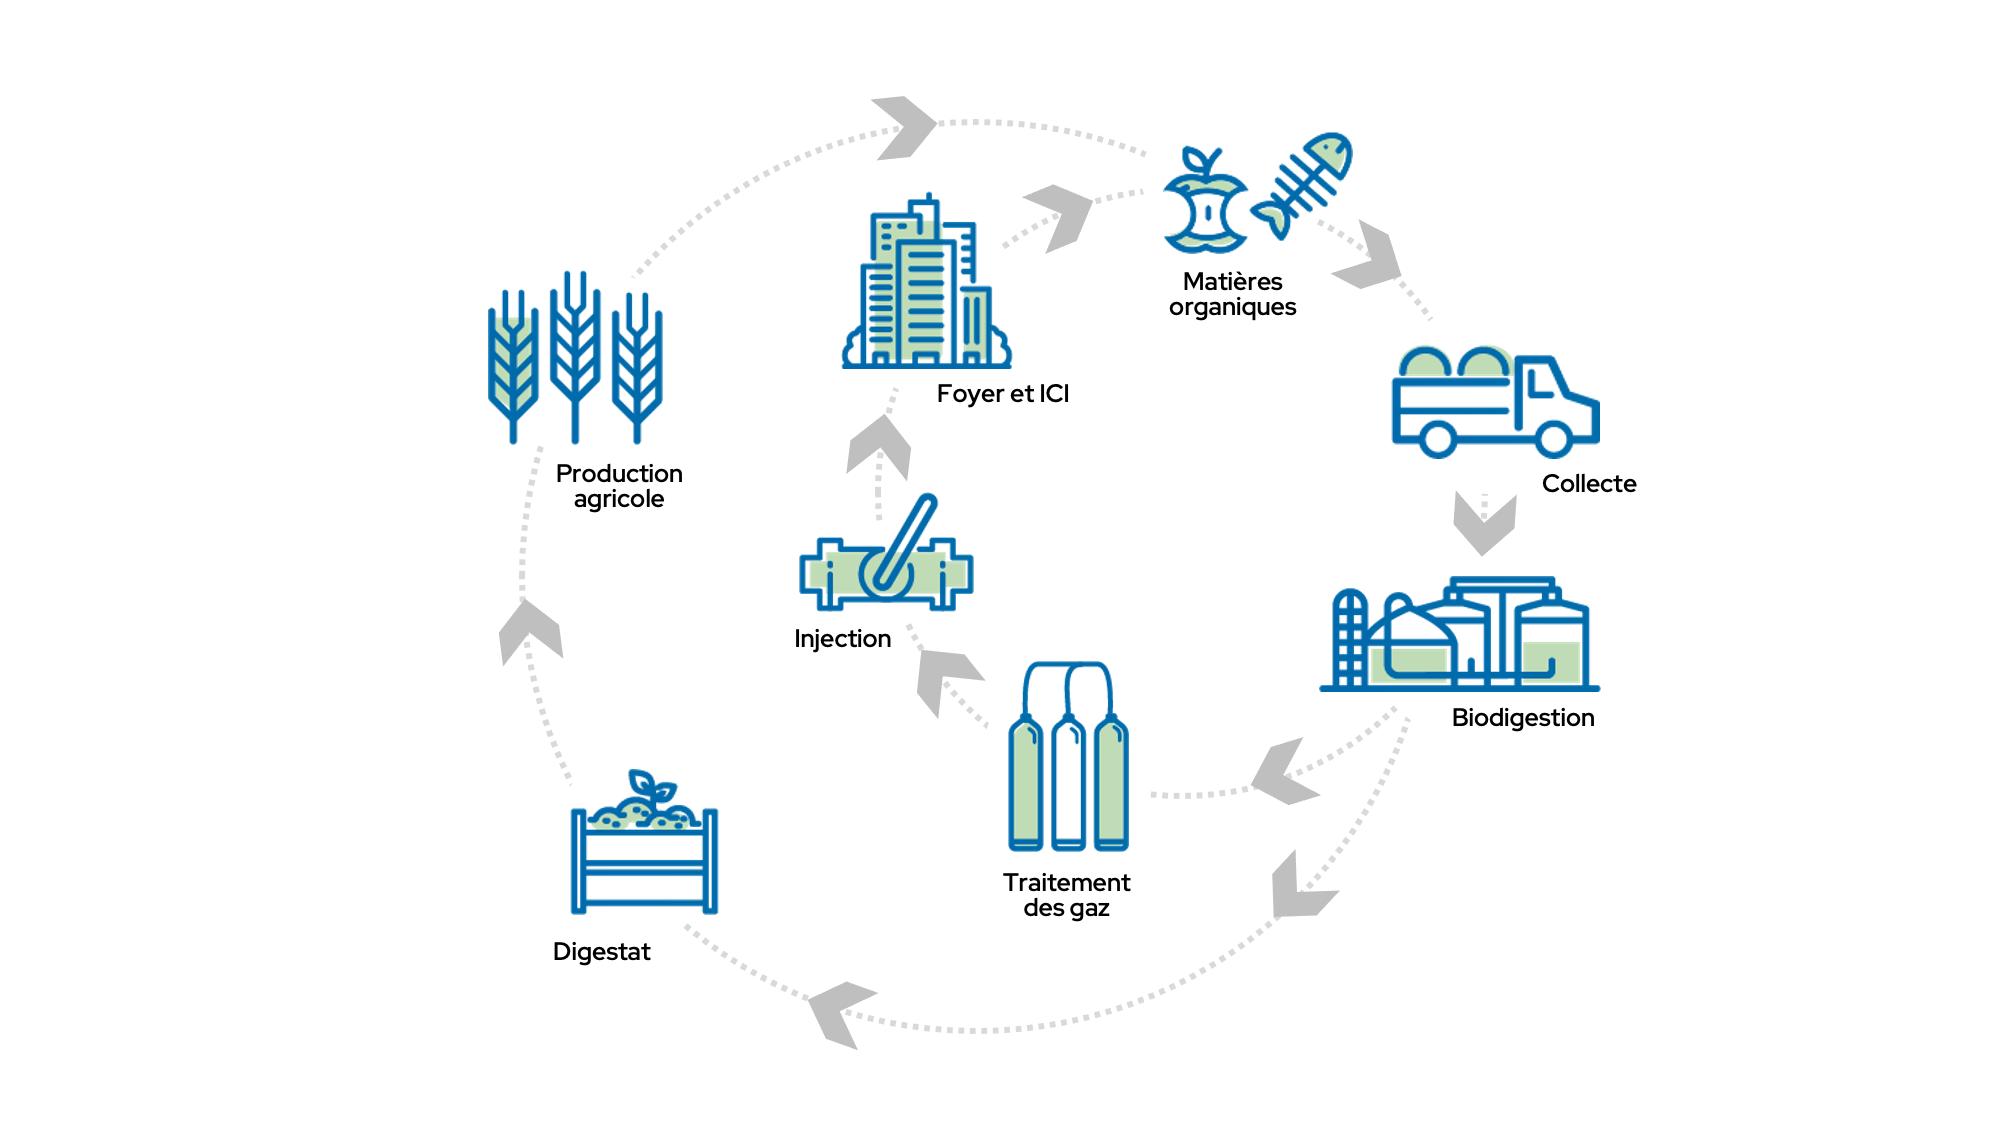 Les avantages du biogaz - GNR Québec Capital